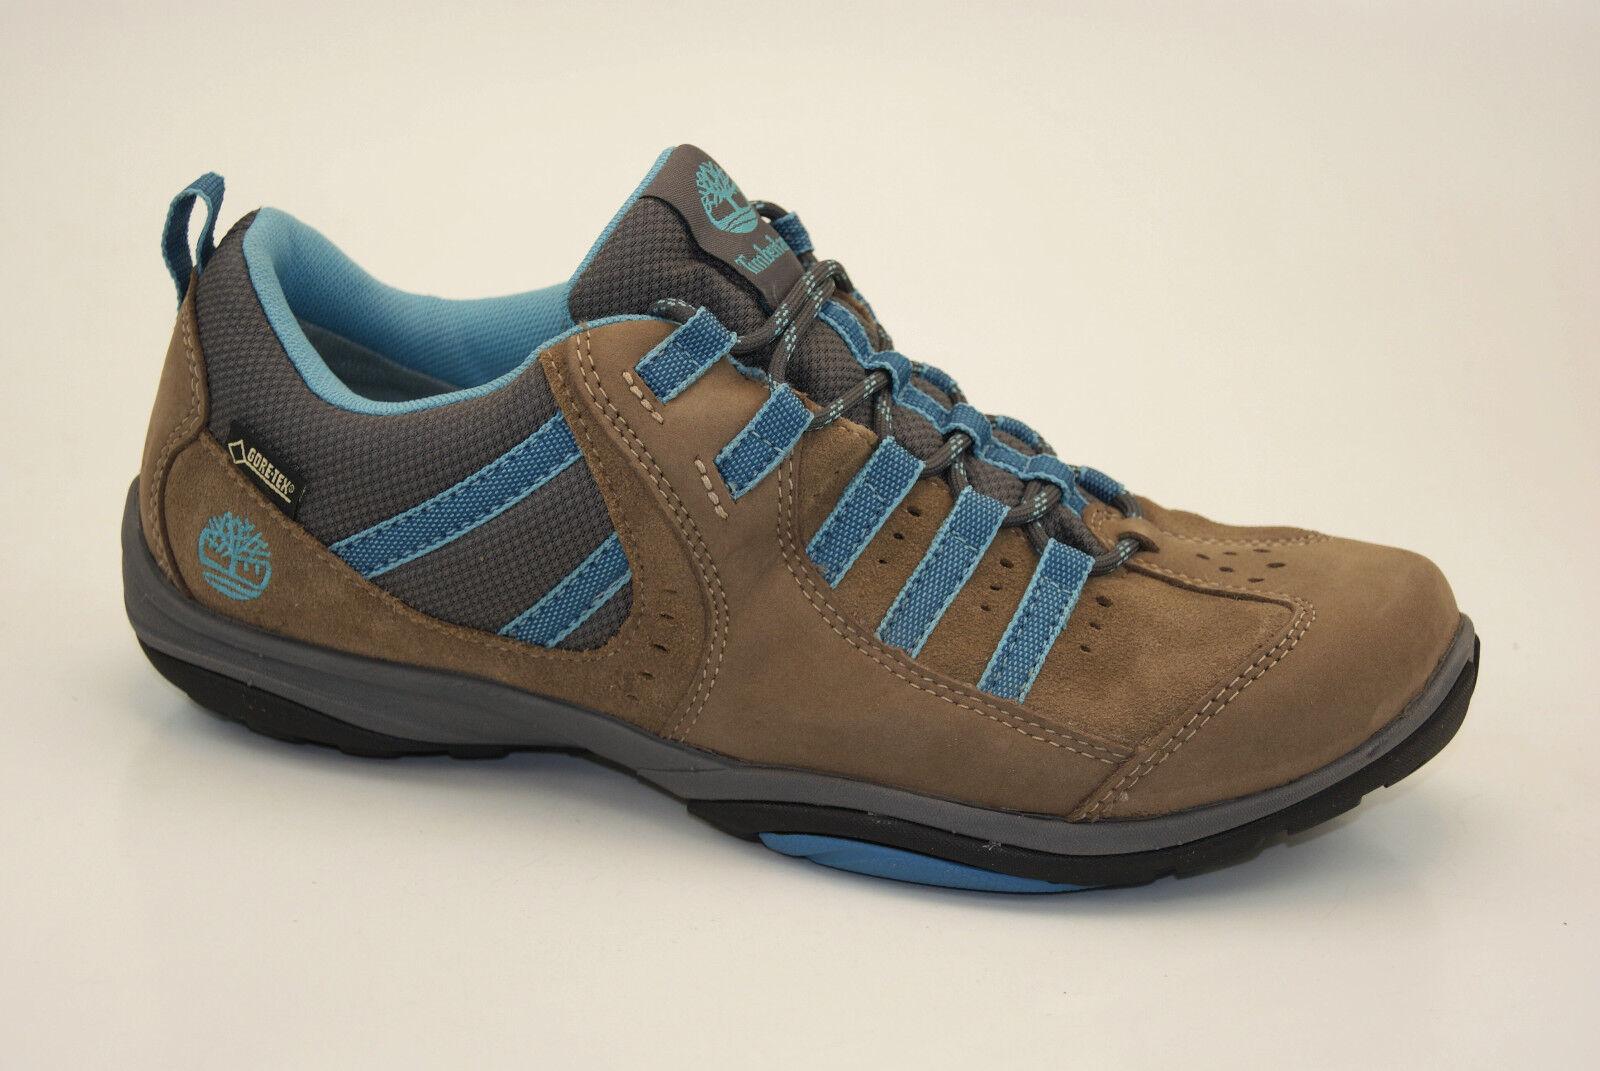 Ecco 5313745073-Scarpe Uomo Sneaker/Schnürschuh, Sneaker/Schnürschuh, Uomo Grigio, Pelle/Tessile adb0a5